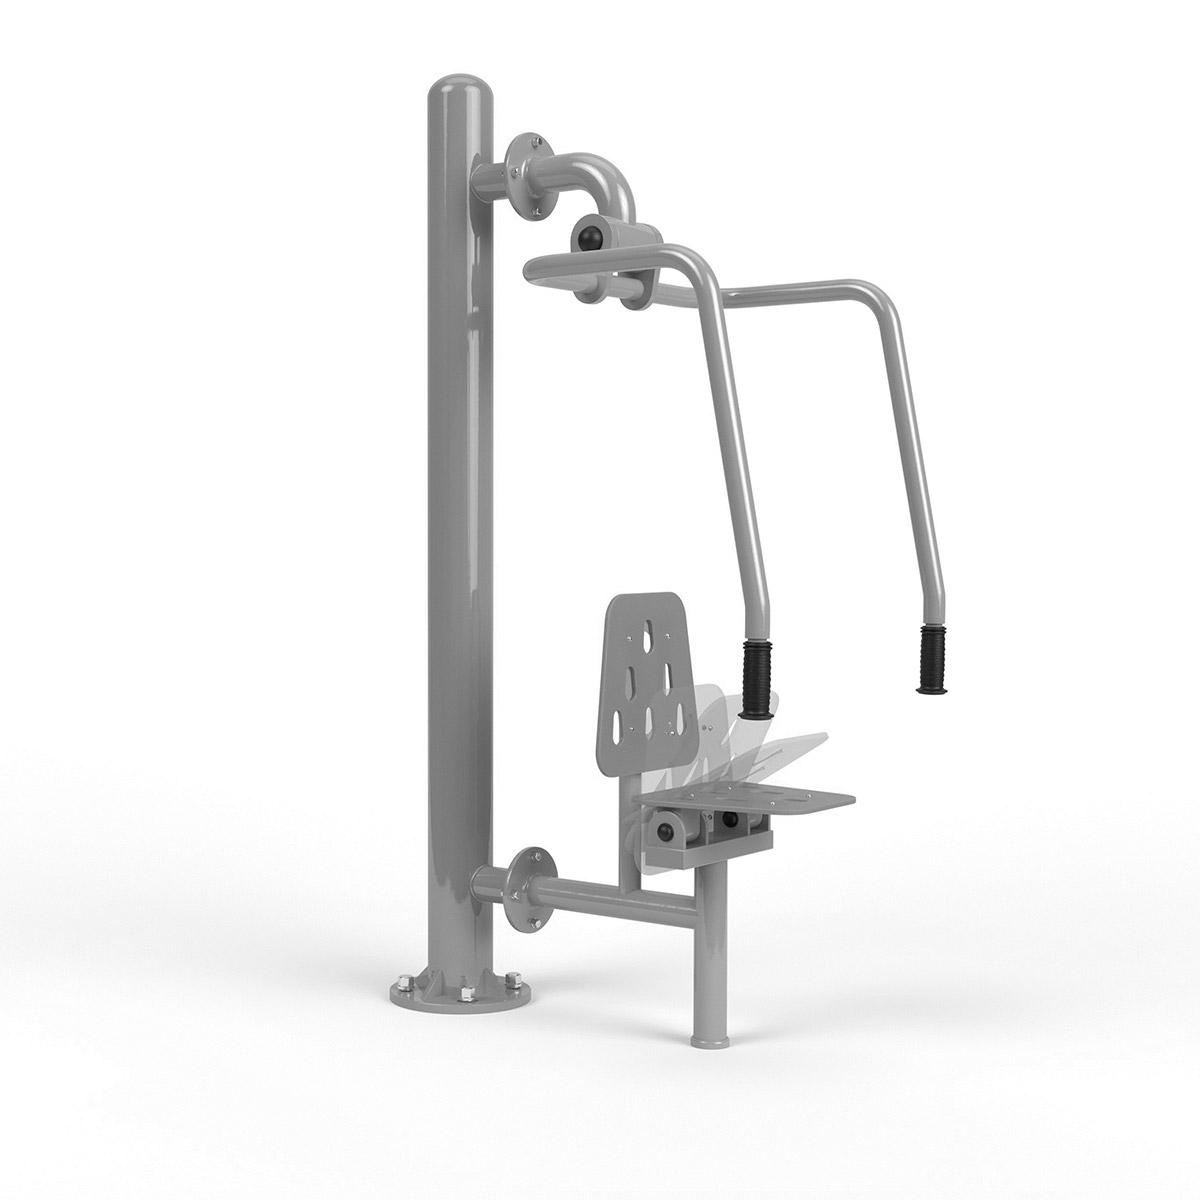 Integrierte brustpresse Edehlstahl + pole Stainless Steel